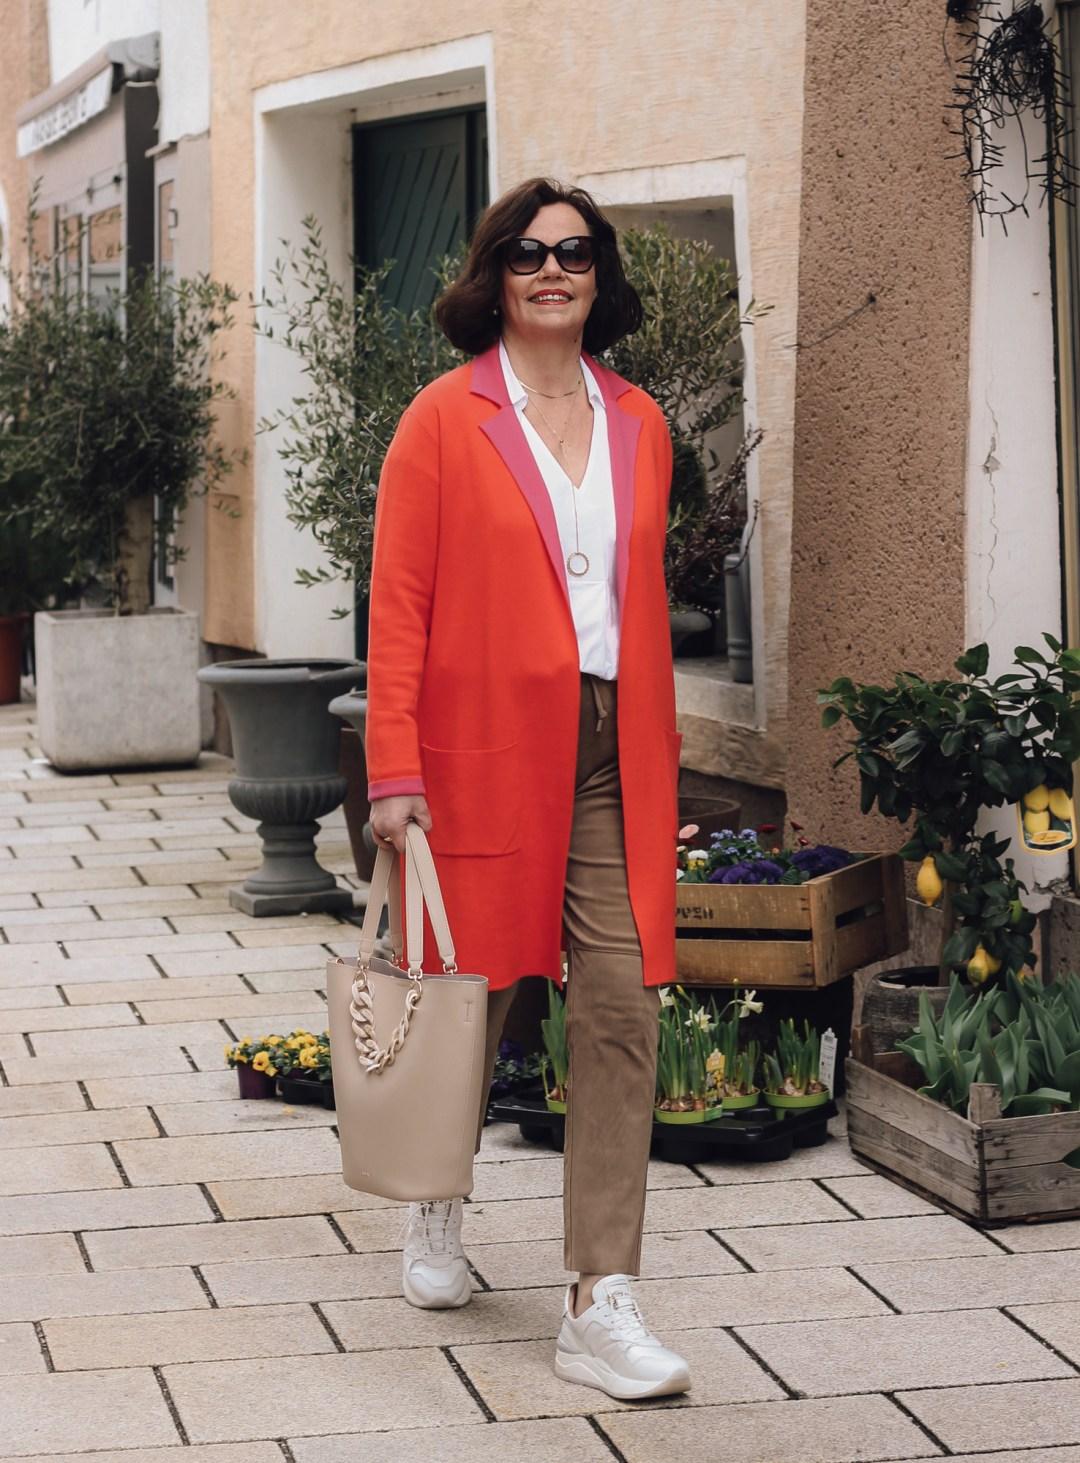 Inastil, Asmus, Schuhe, Taschen, Frühlingsmode, Springfashion, lokal einkaufen, Ü50Modeblog, Stilberatung, Styleinspiration, Frühling2020-12